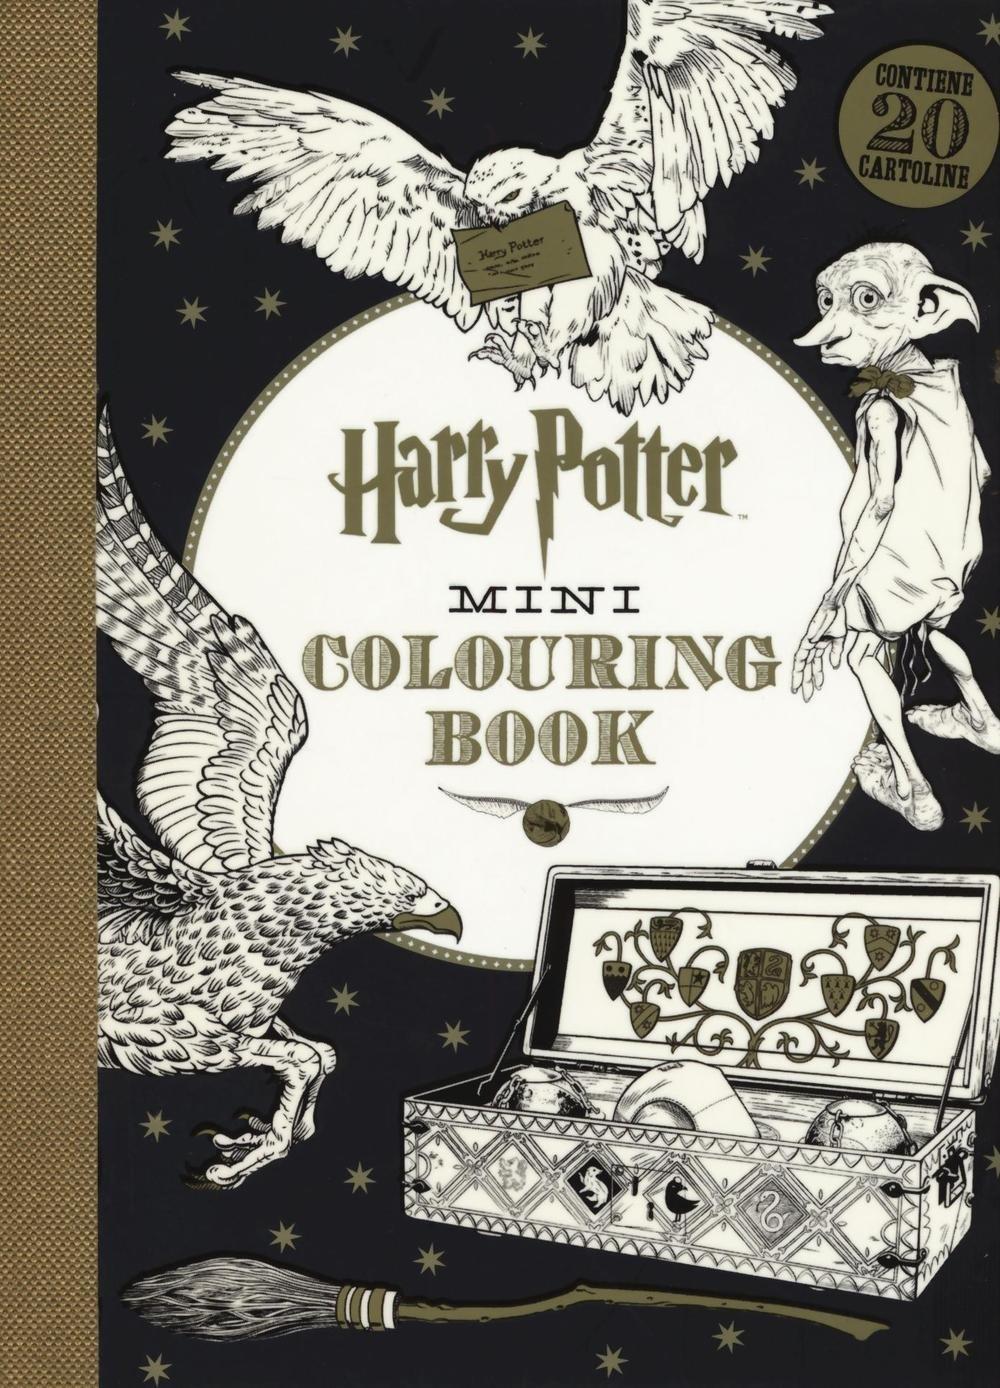 Harry Potter mini colouring book. Ediz. illustrata